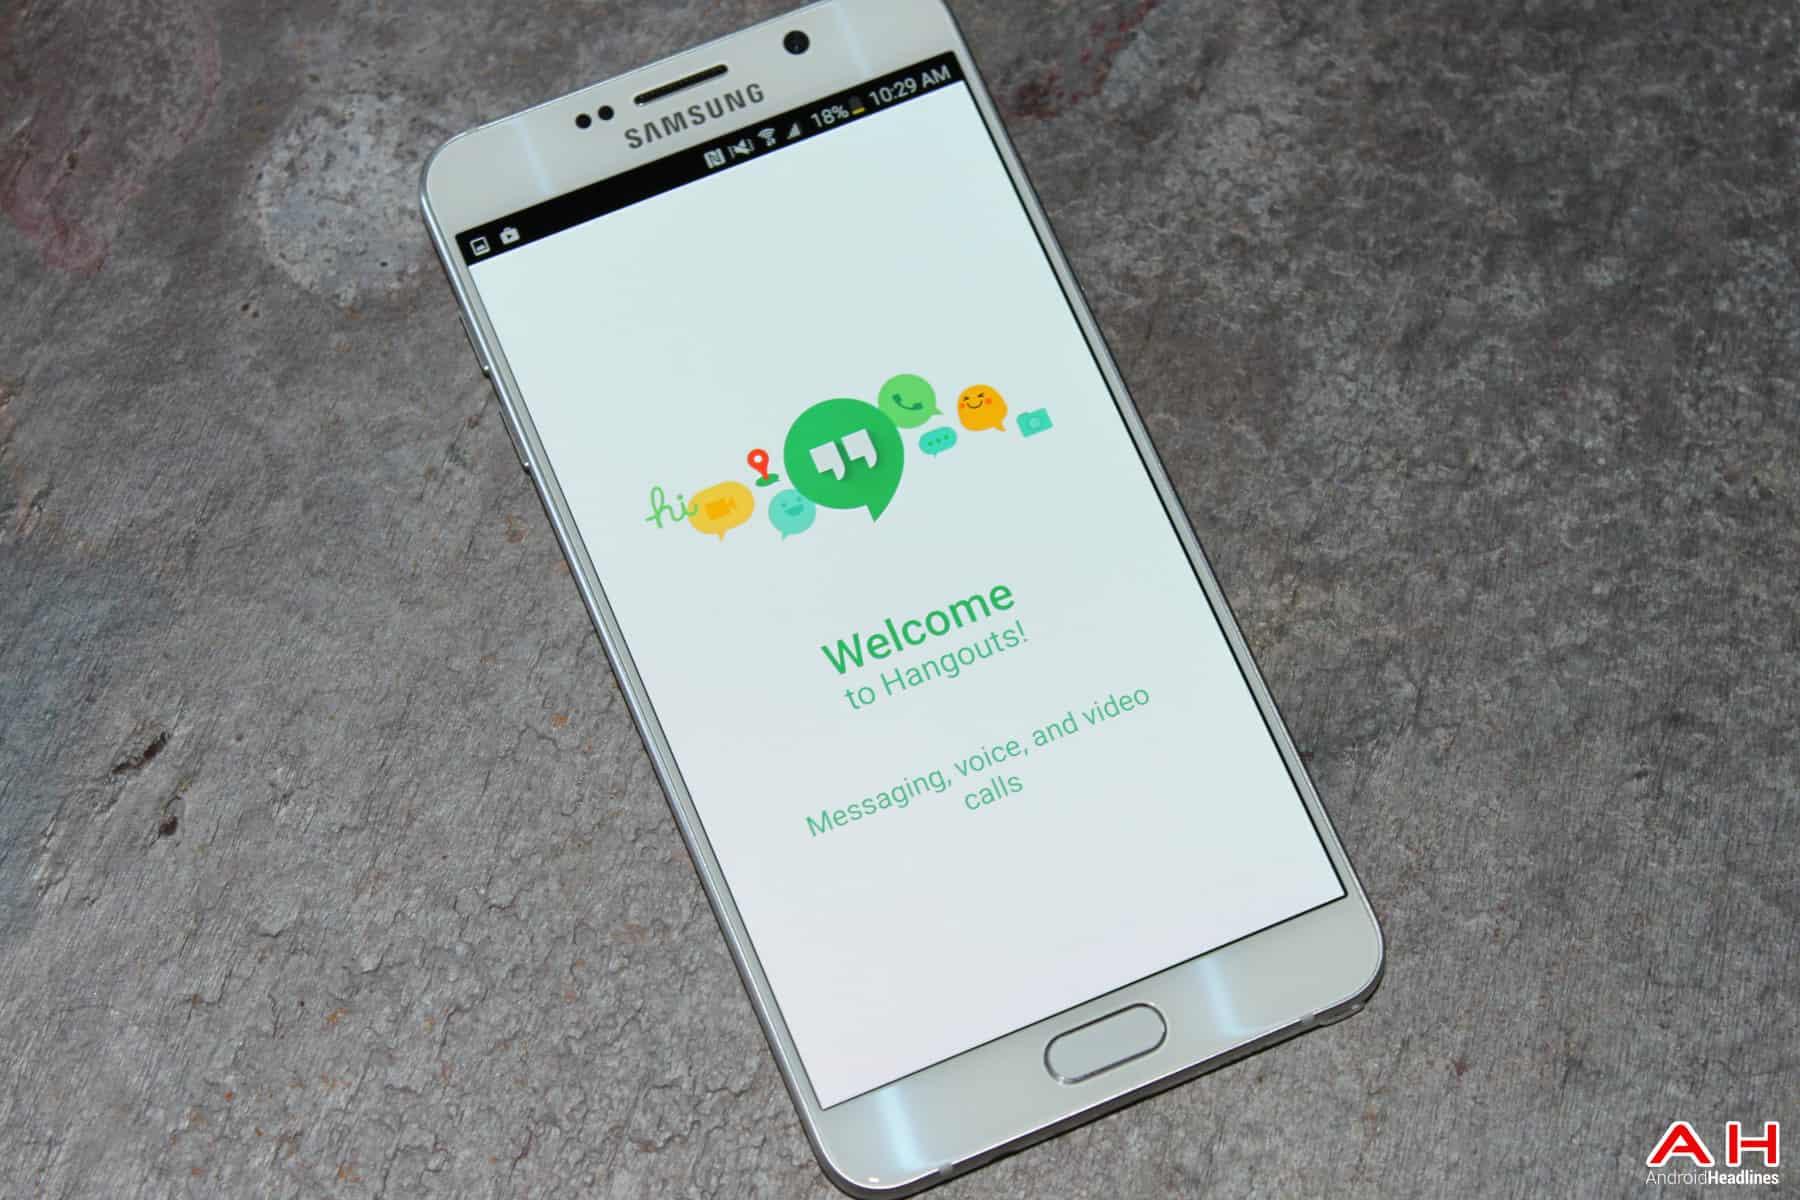 Google Gives Free Hangouts Calls To Turkey Following Attacks | Androidheadlines.com